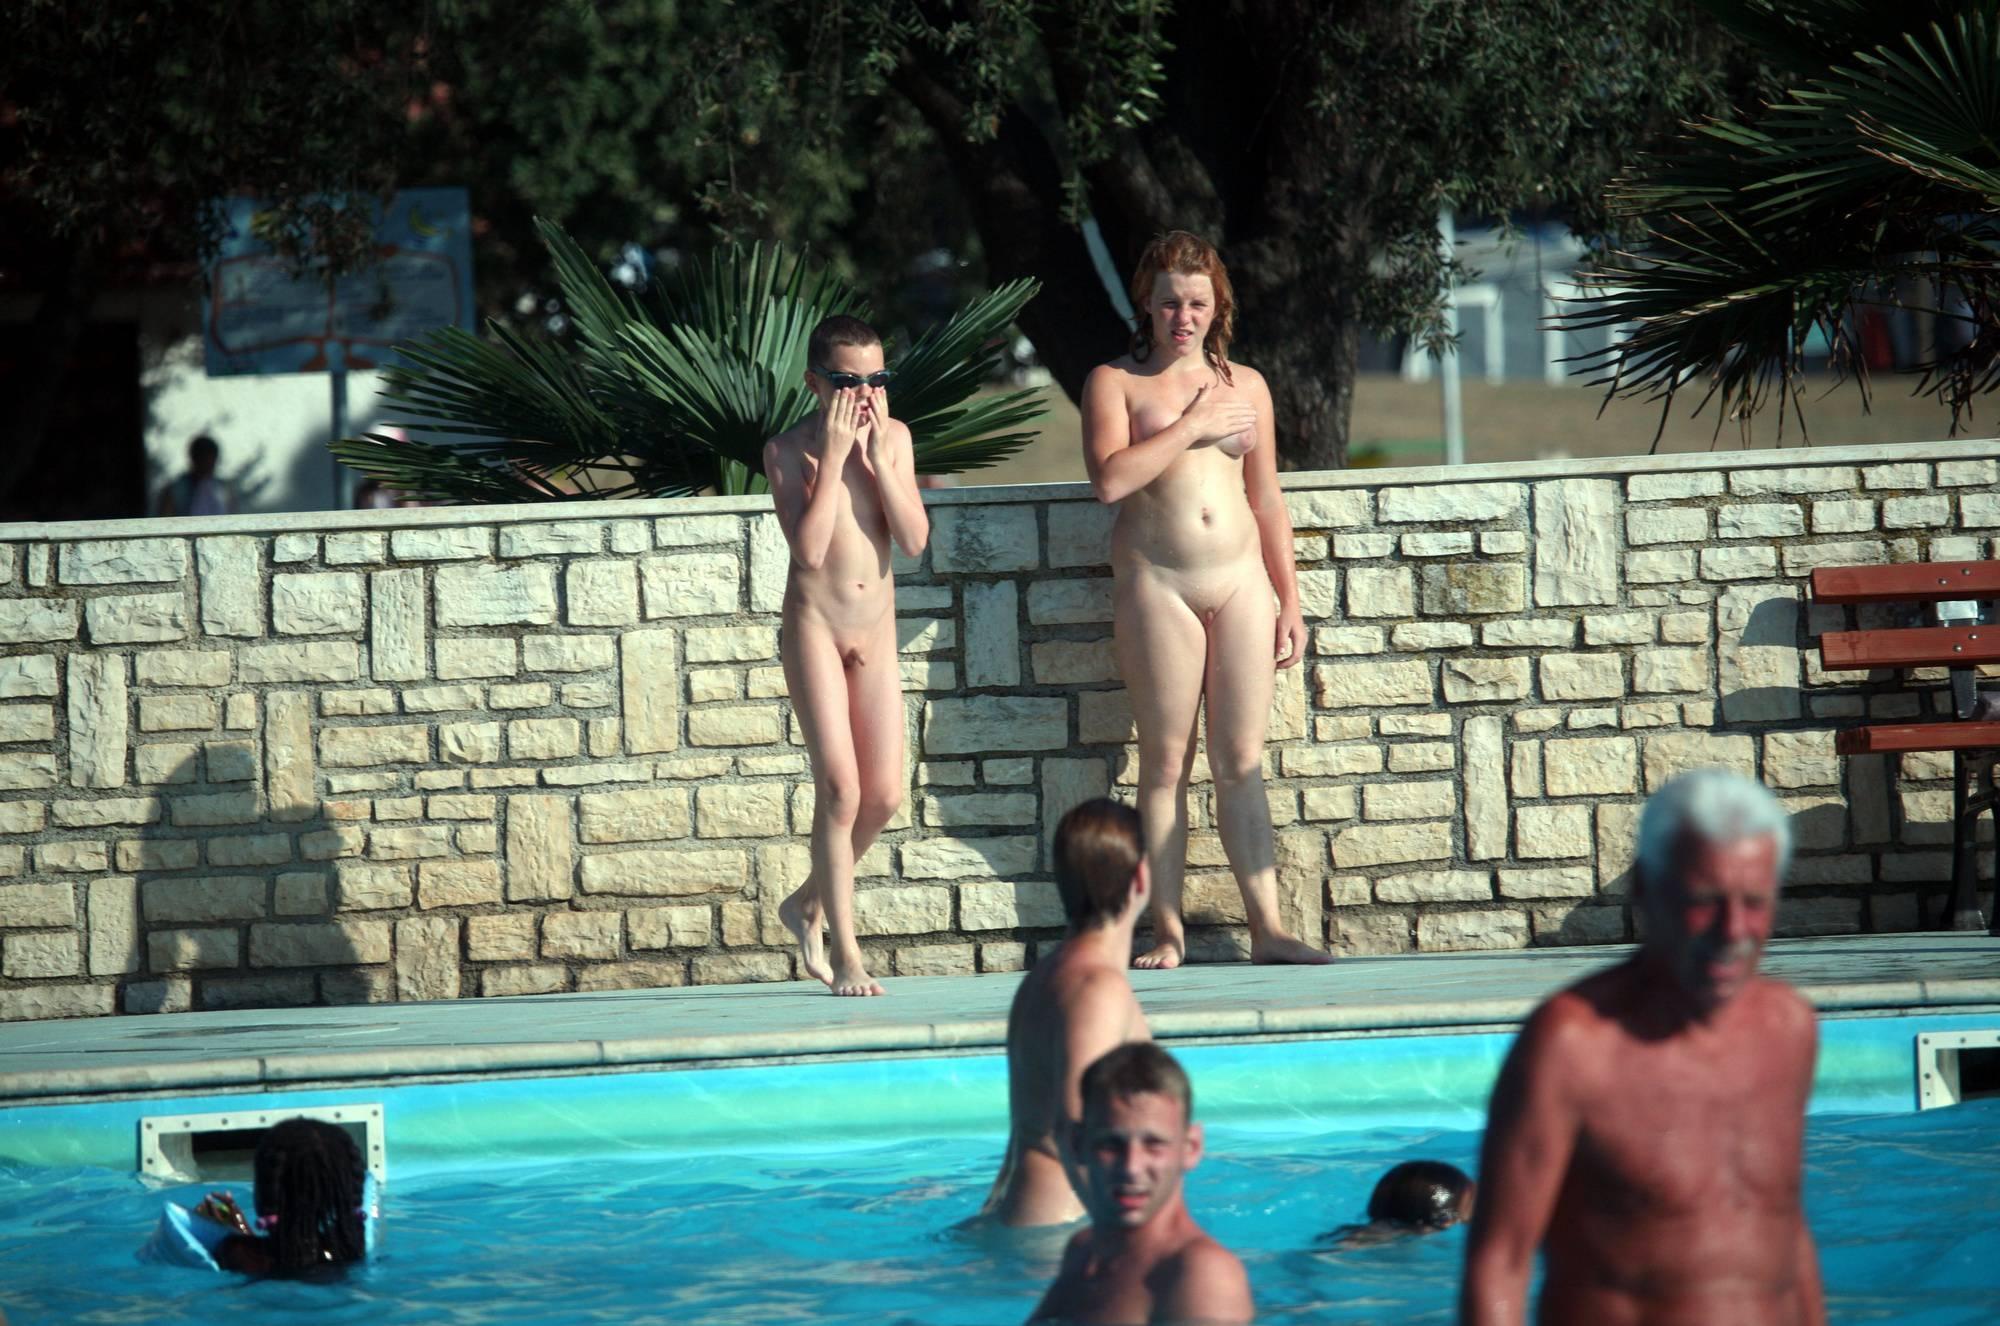 Purenudism Pics Nudist Pool Group Gather - 3